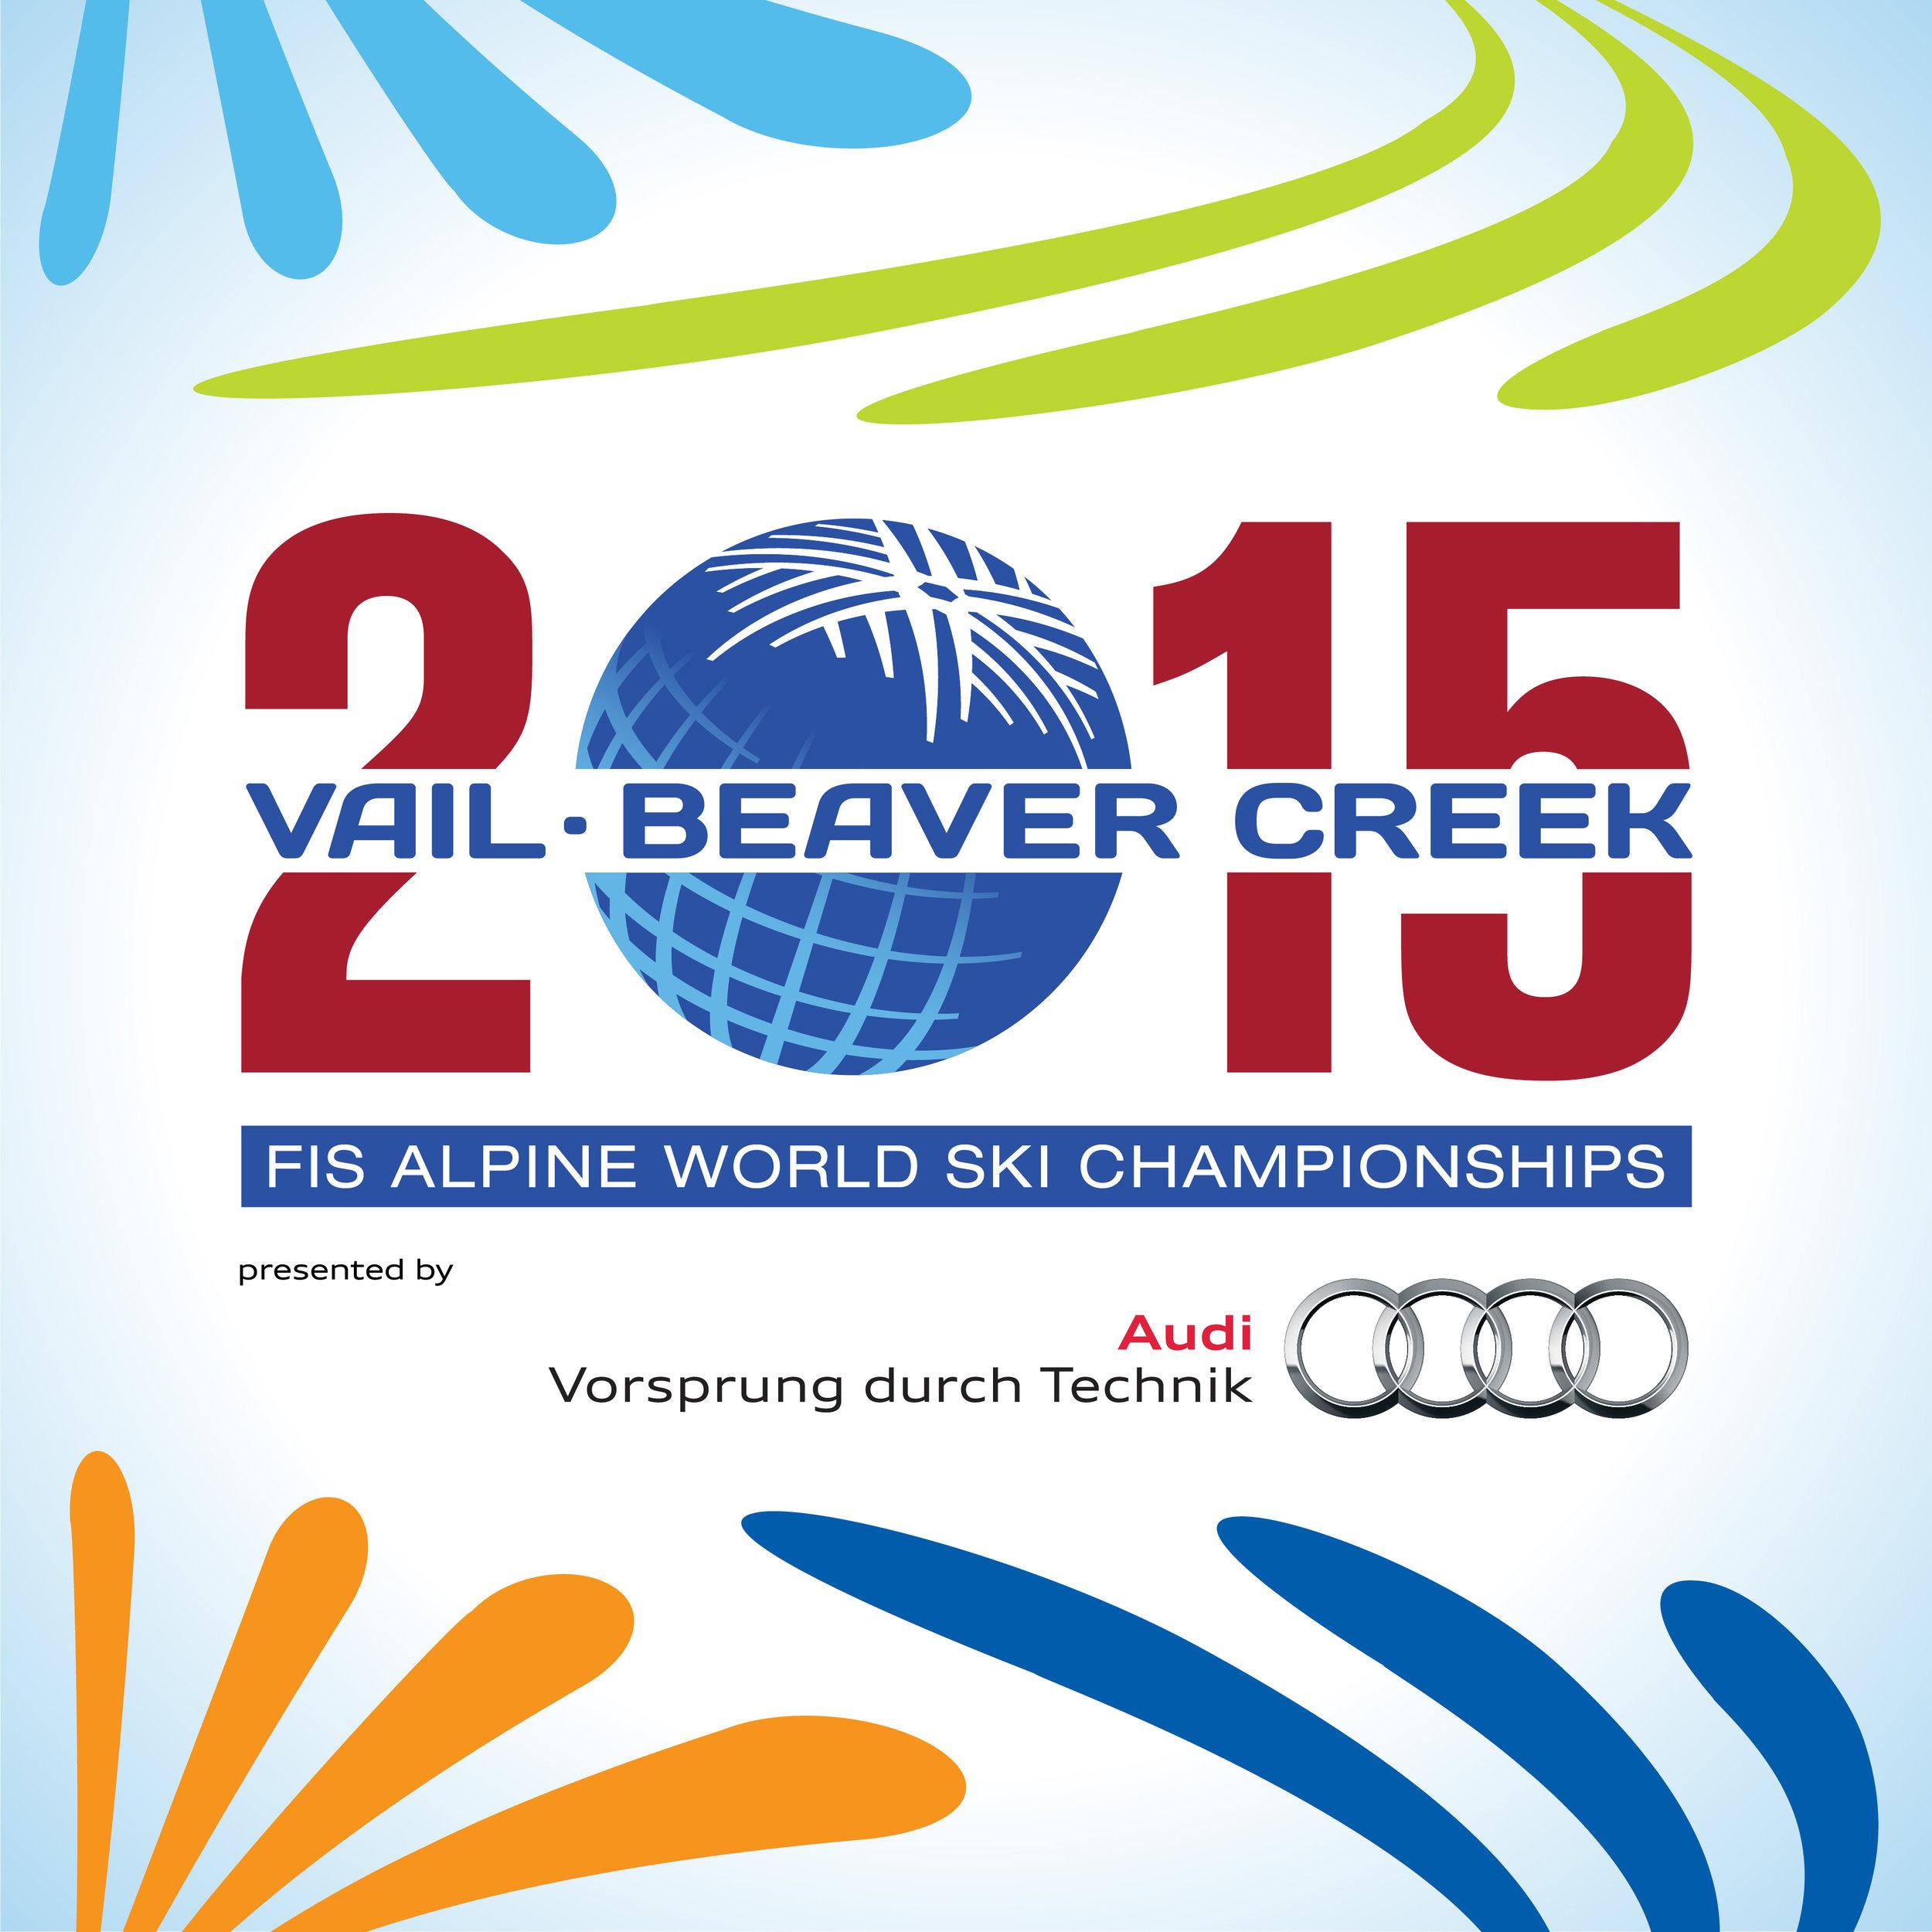 Alpine World Ski Championships